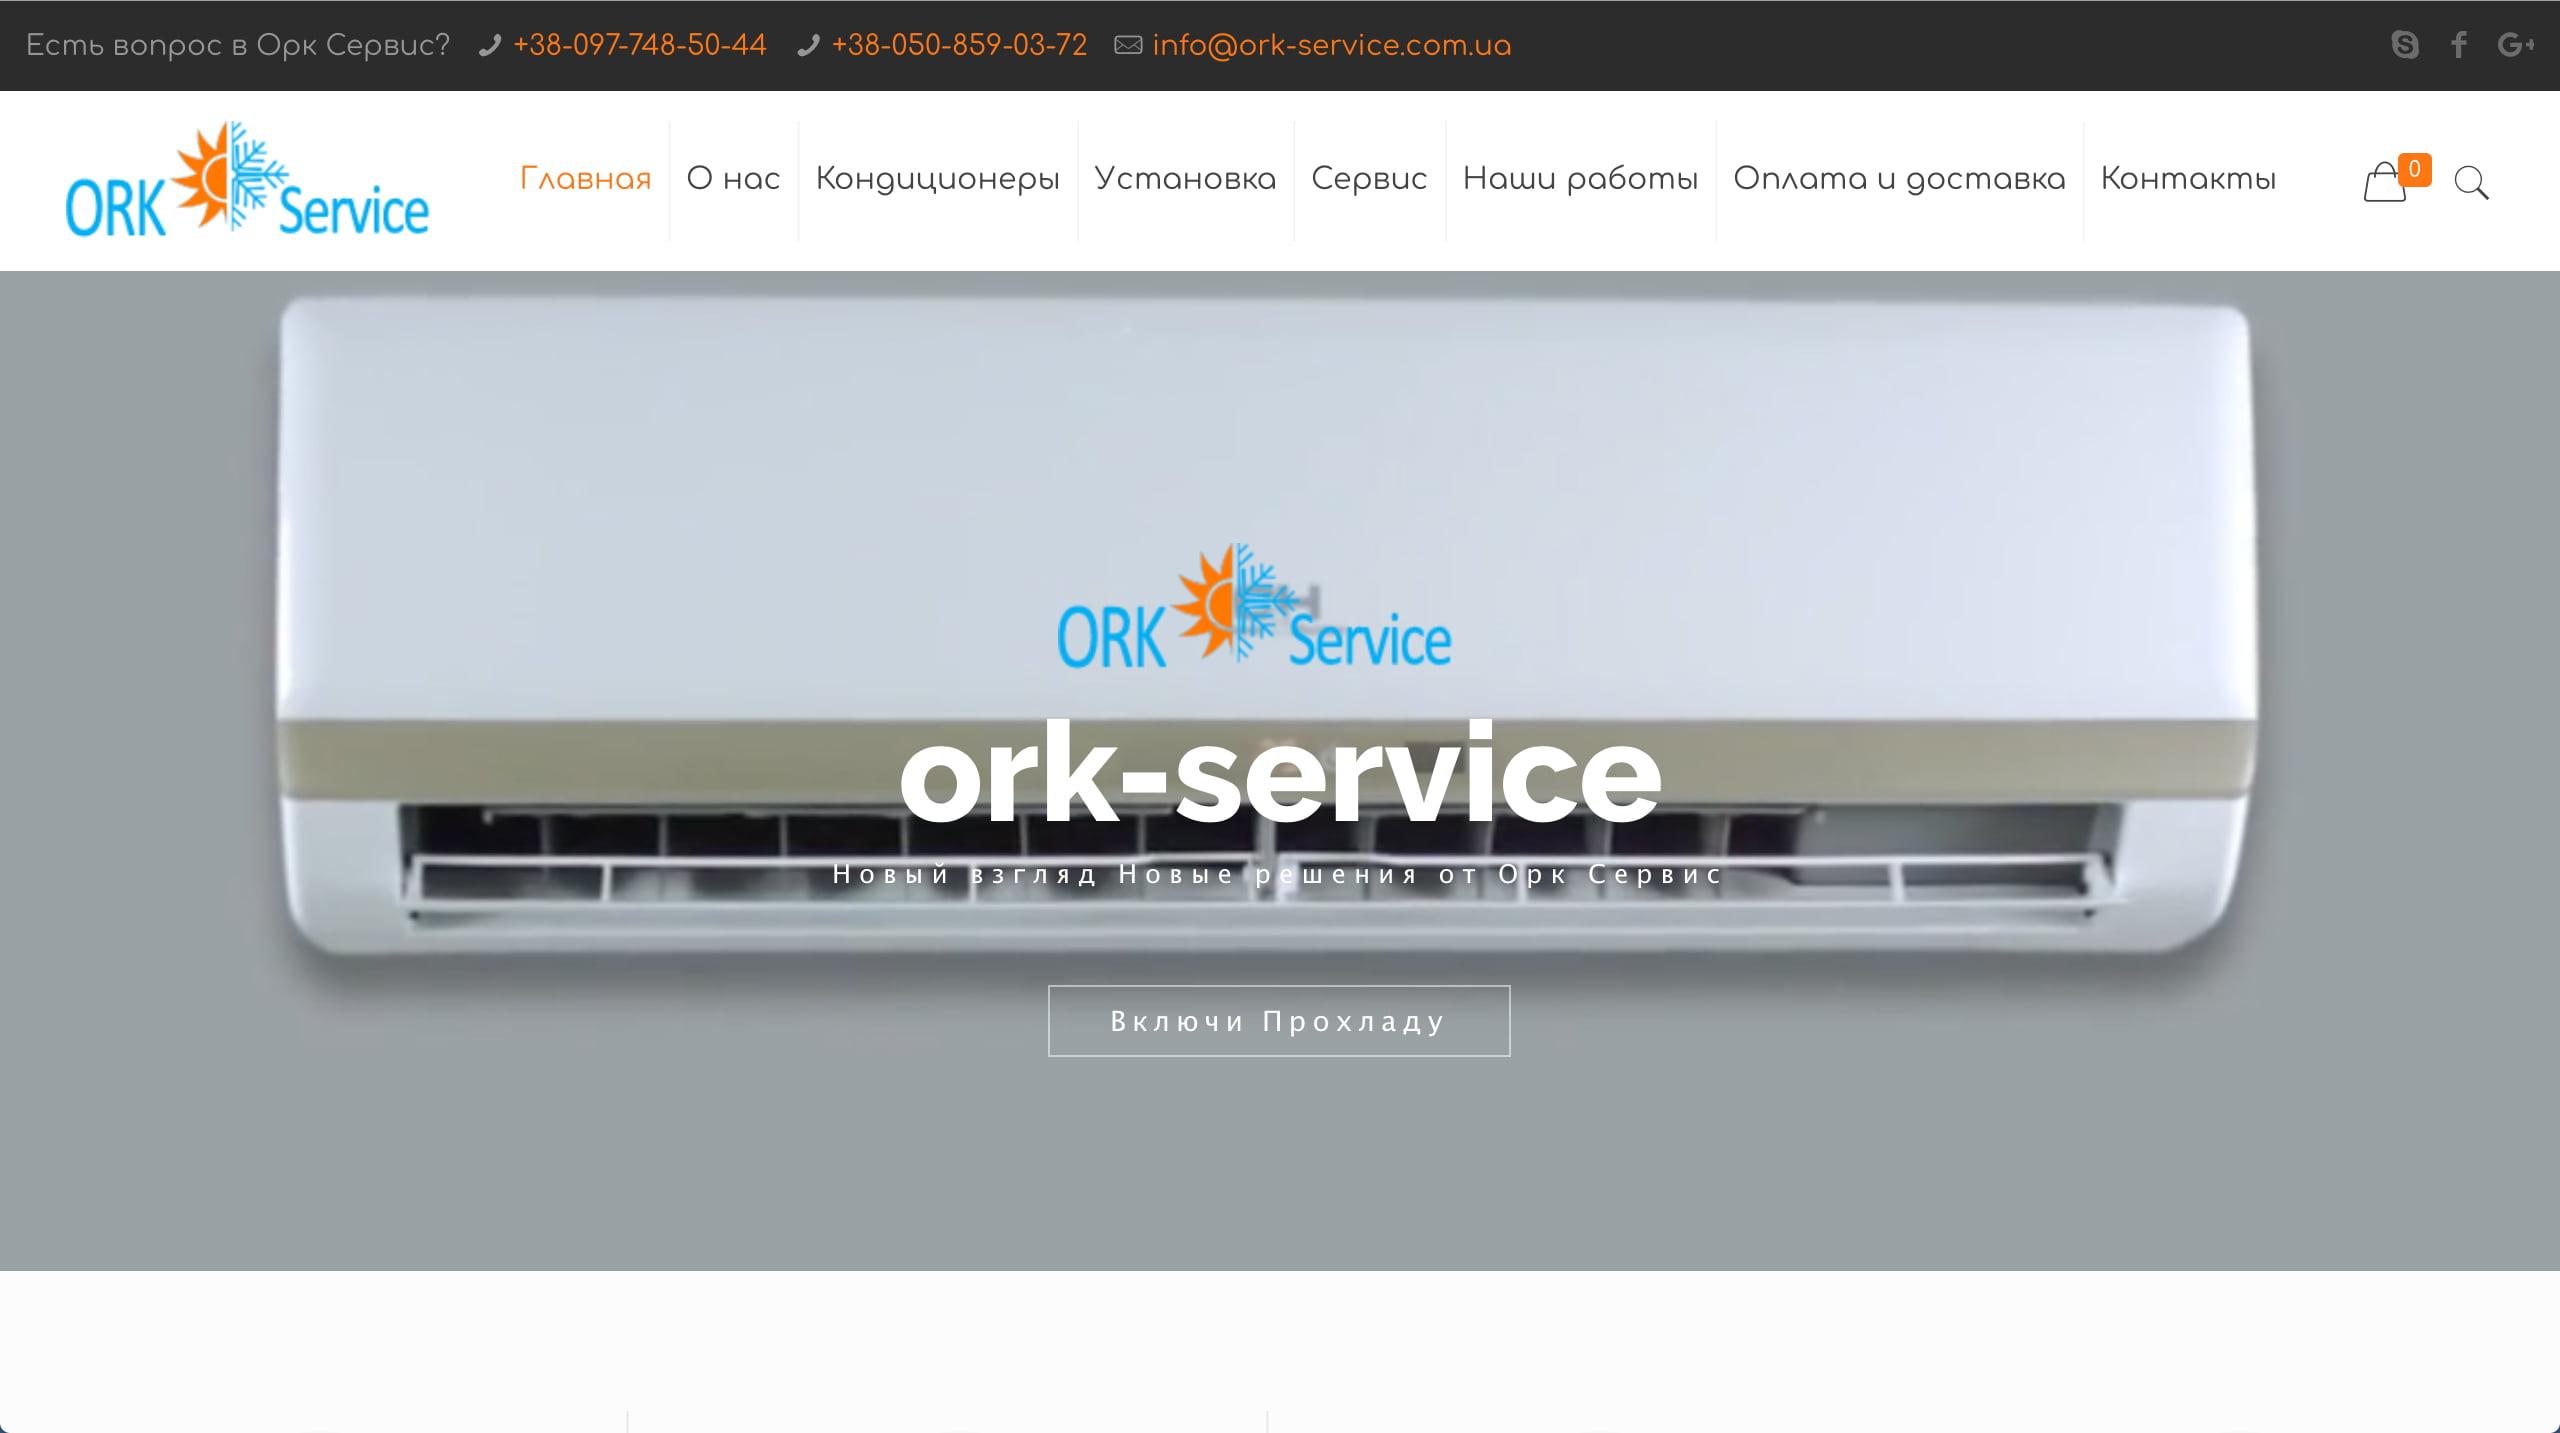 Ork-Service